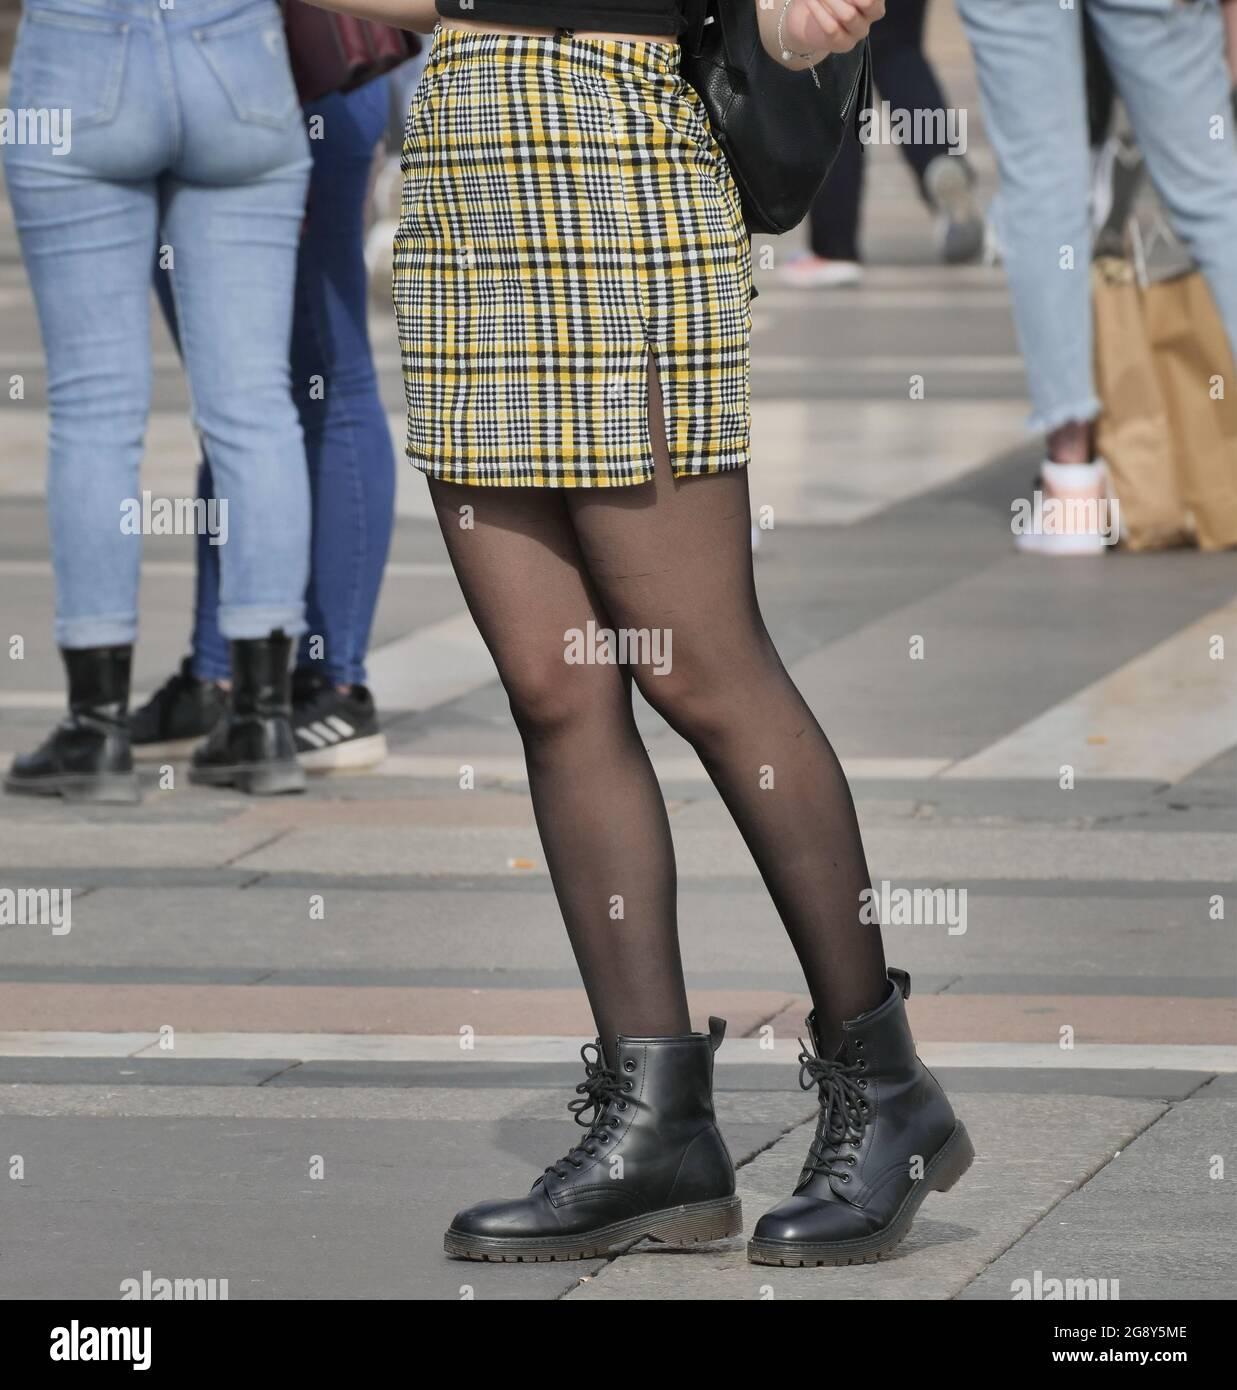 Miniskirt pantyhose and Mini Skirt